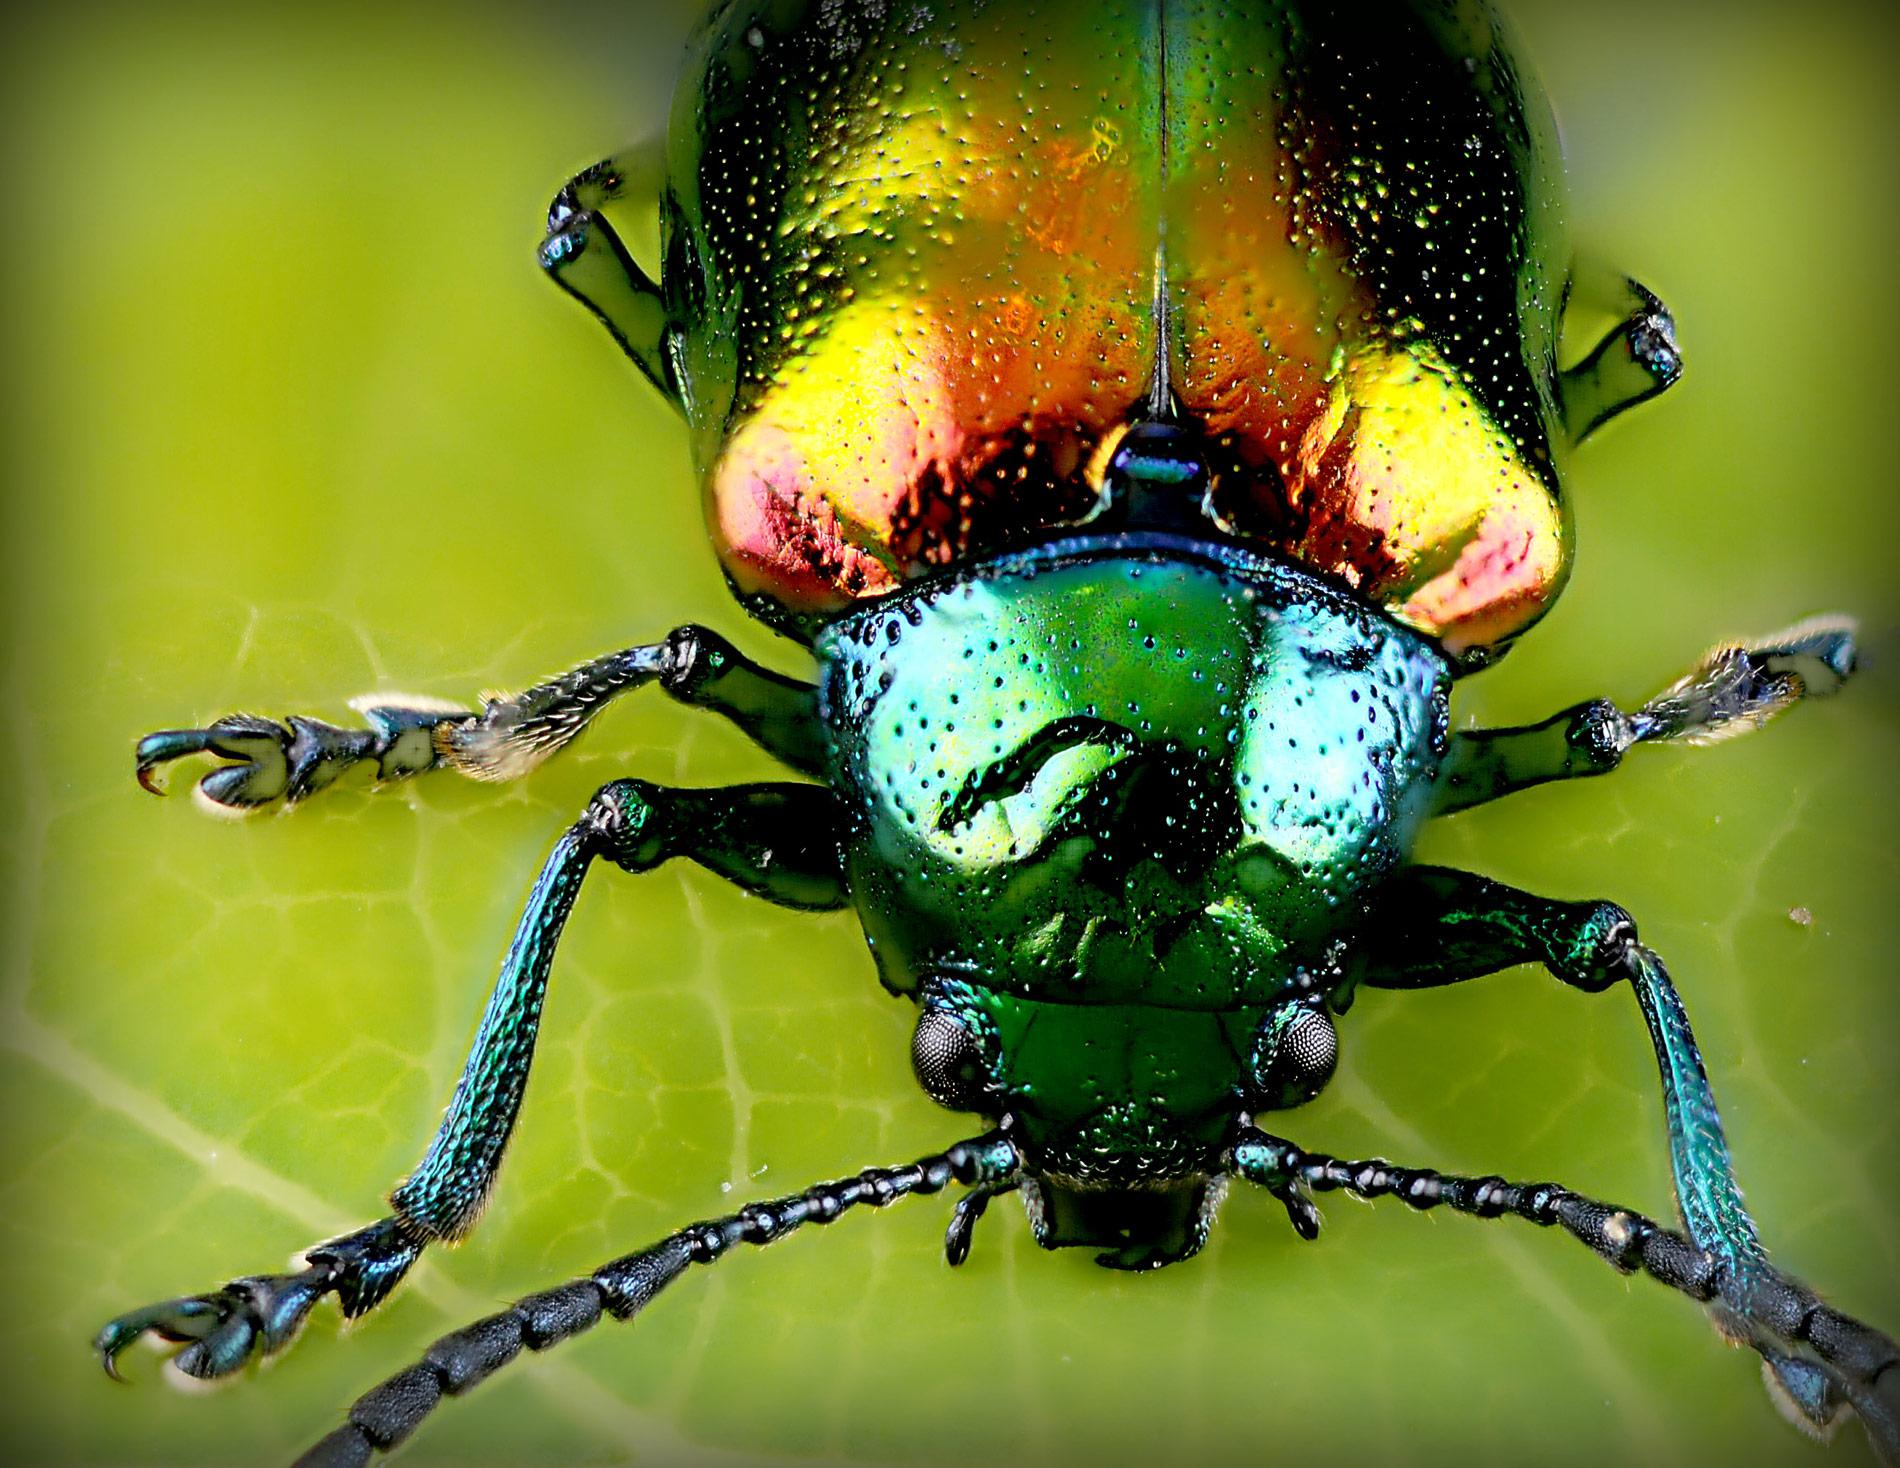 Entomofagia, lo que debes saber antes de ponerte a comer insectos